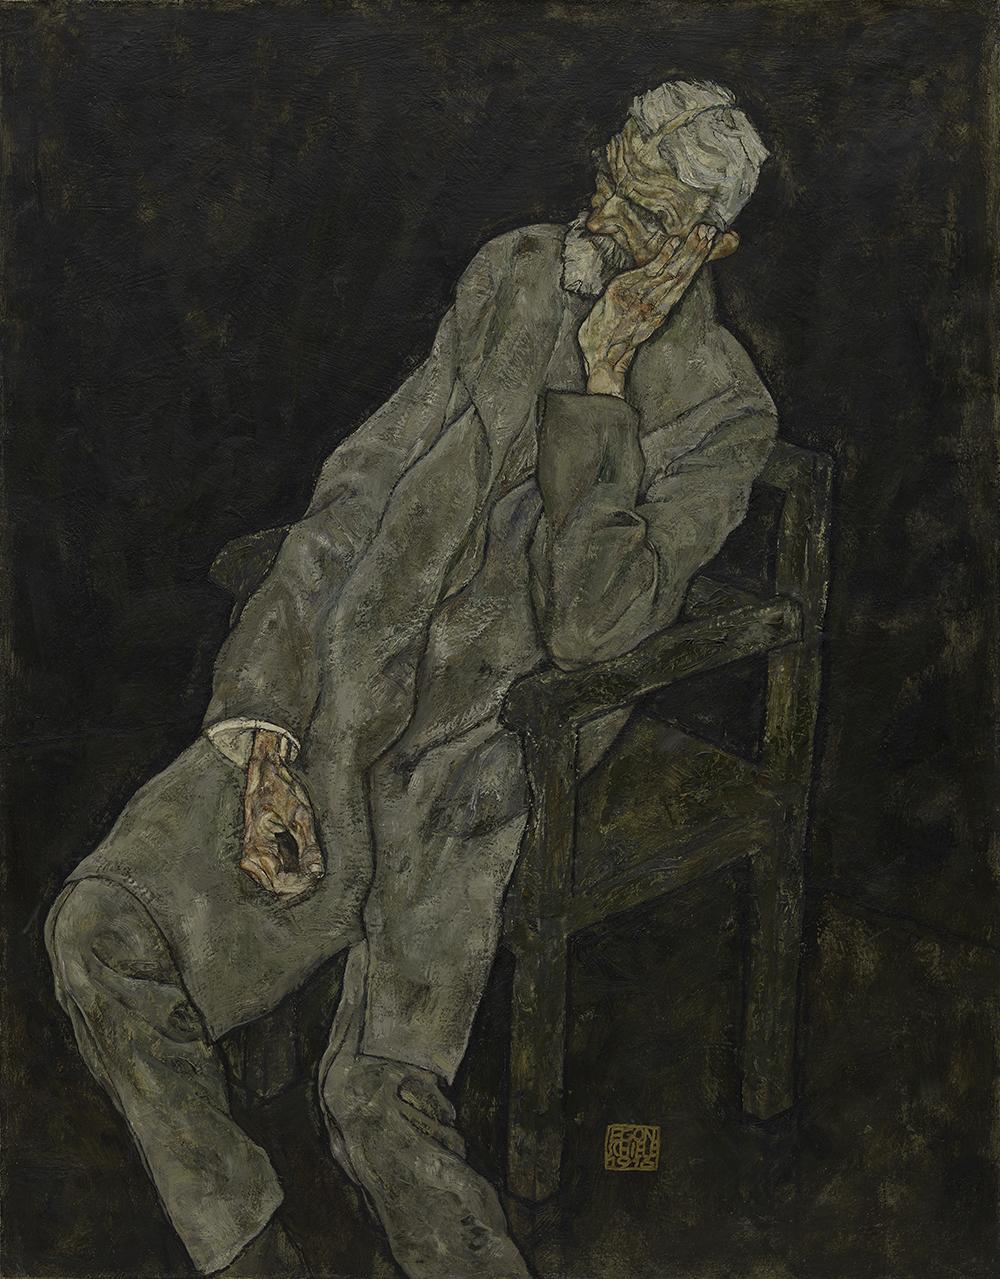 "Egon Schiele, ""Portrait of Johann Harms"" (1916), oil with wax on canvas (The Solomon R. Guggenheim Museum, New York, photo credit: The Solomon R. Guggenheim Foundation / Art Resource, NY)"